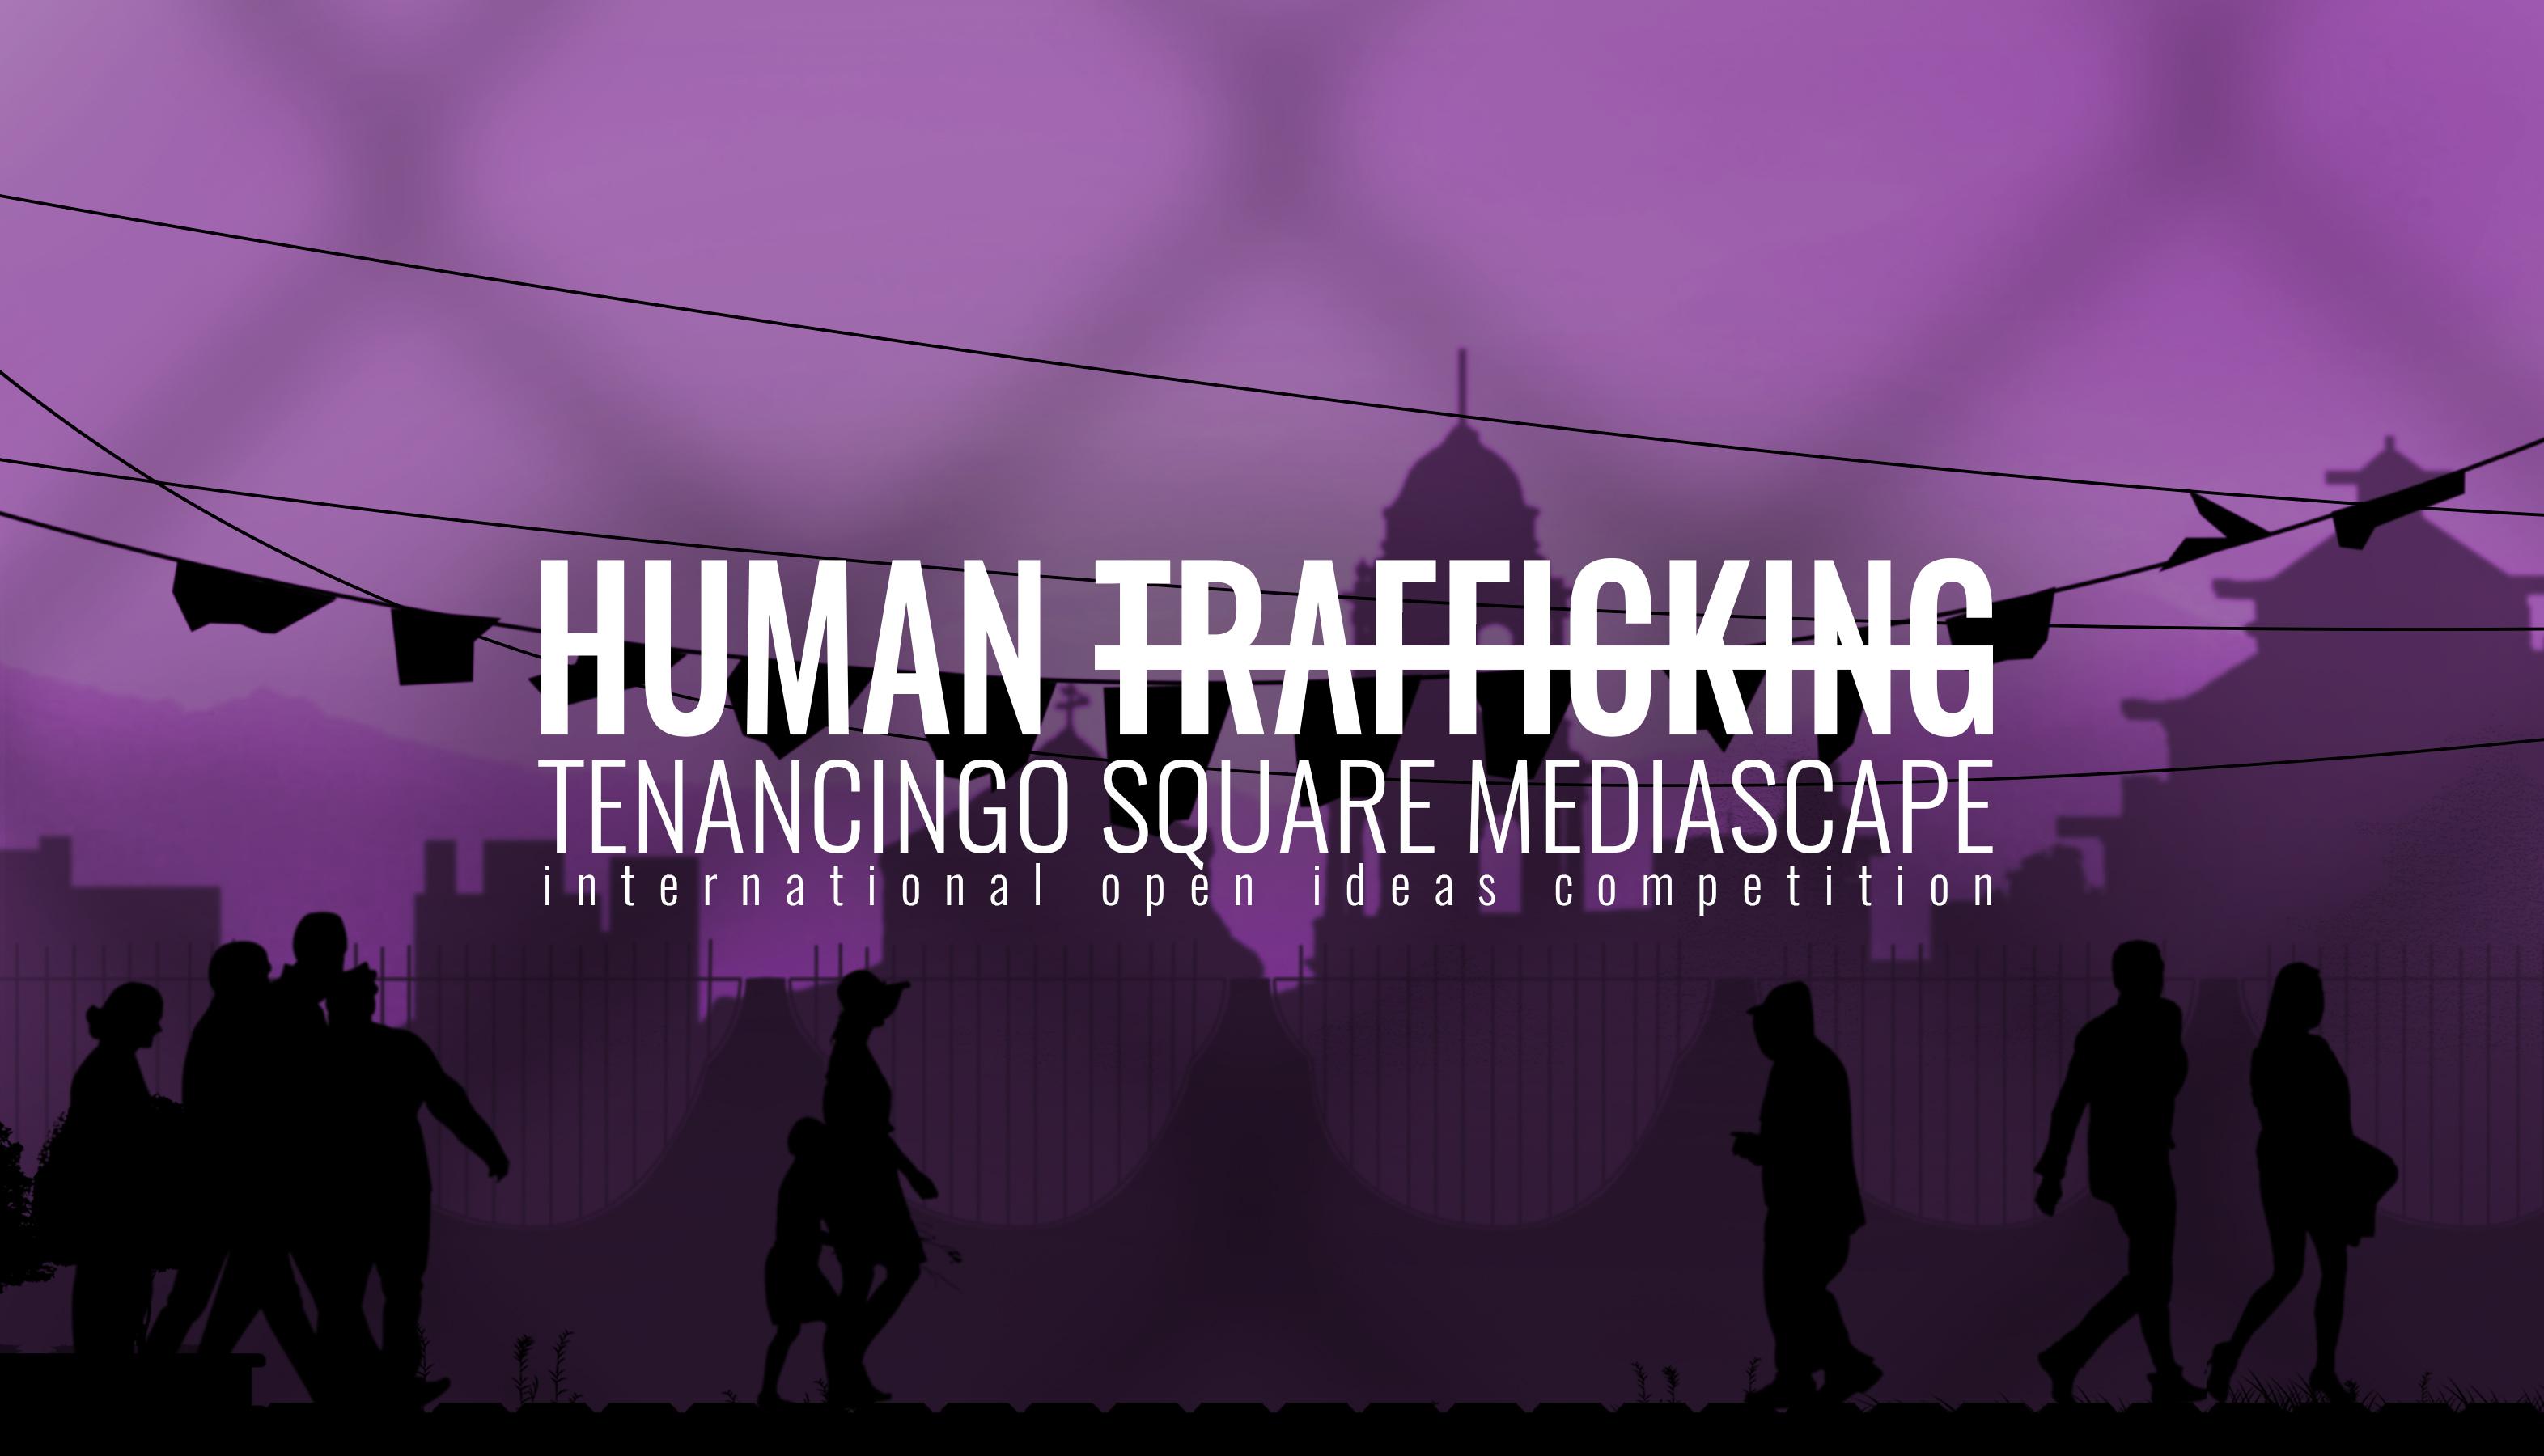 HUMAN TRAFFICKING - Tenancingo Square Mediascape competition